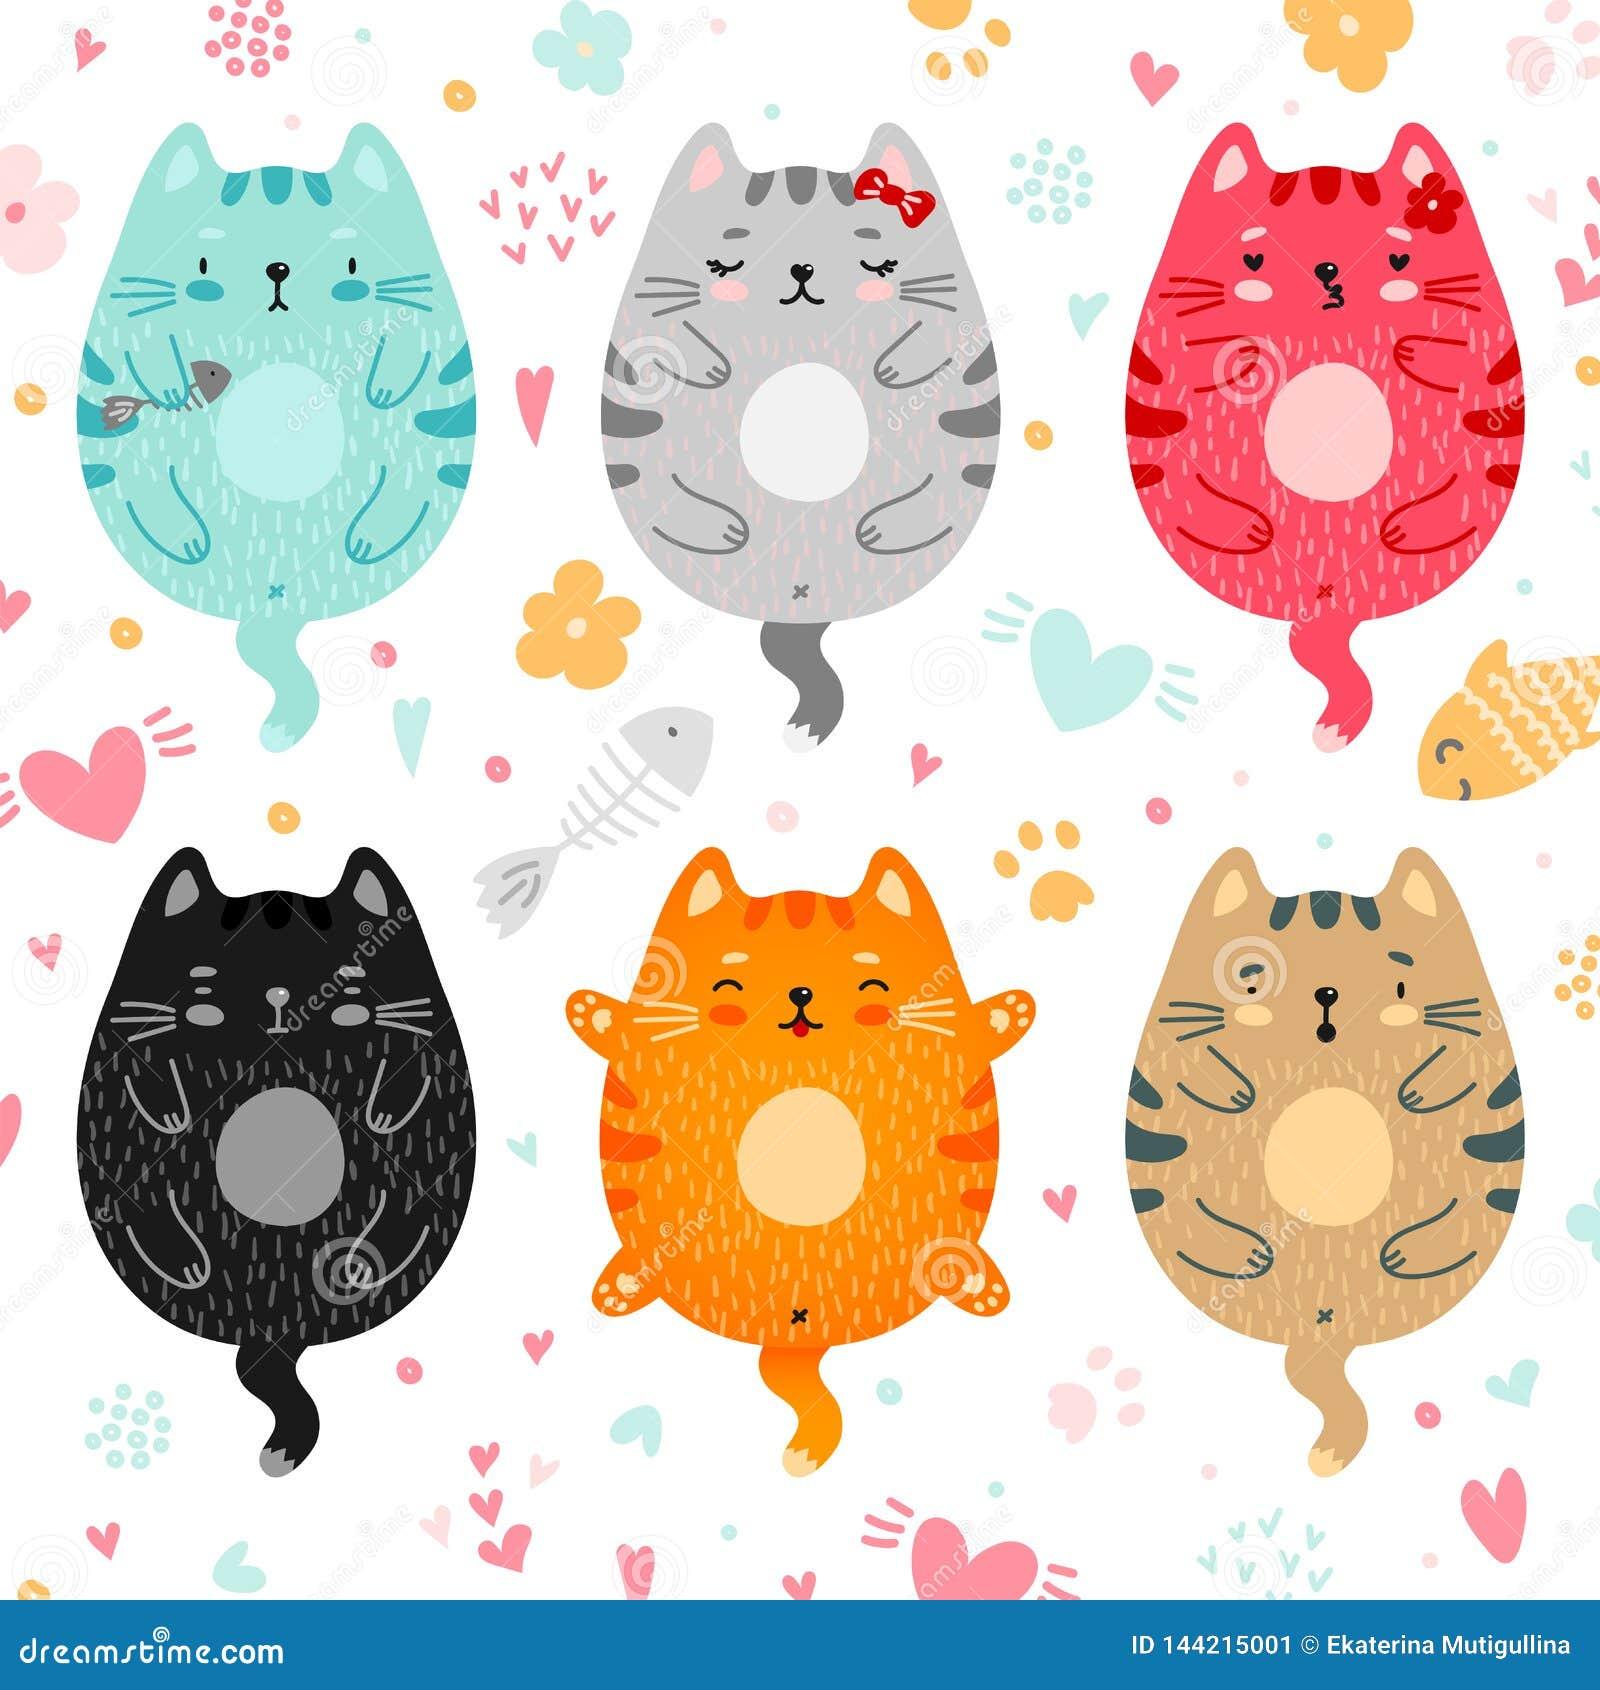 Doodle colored cats set